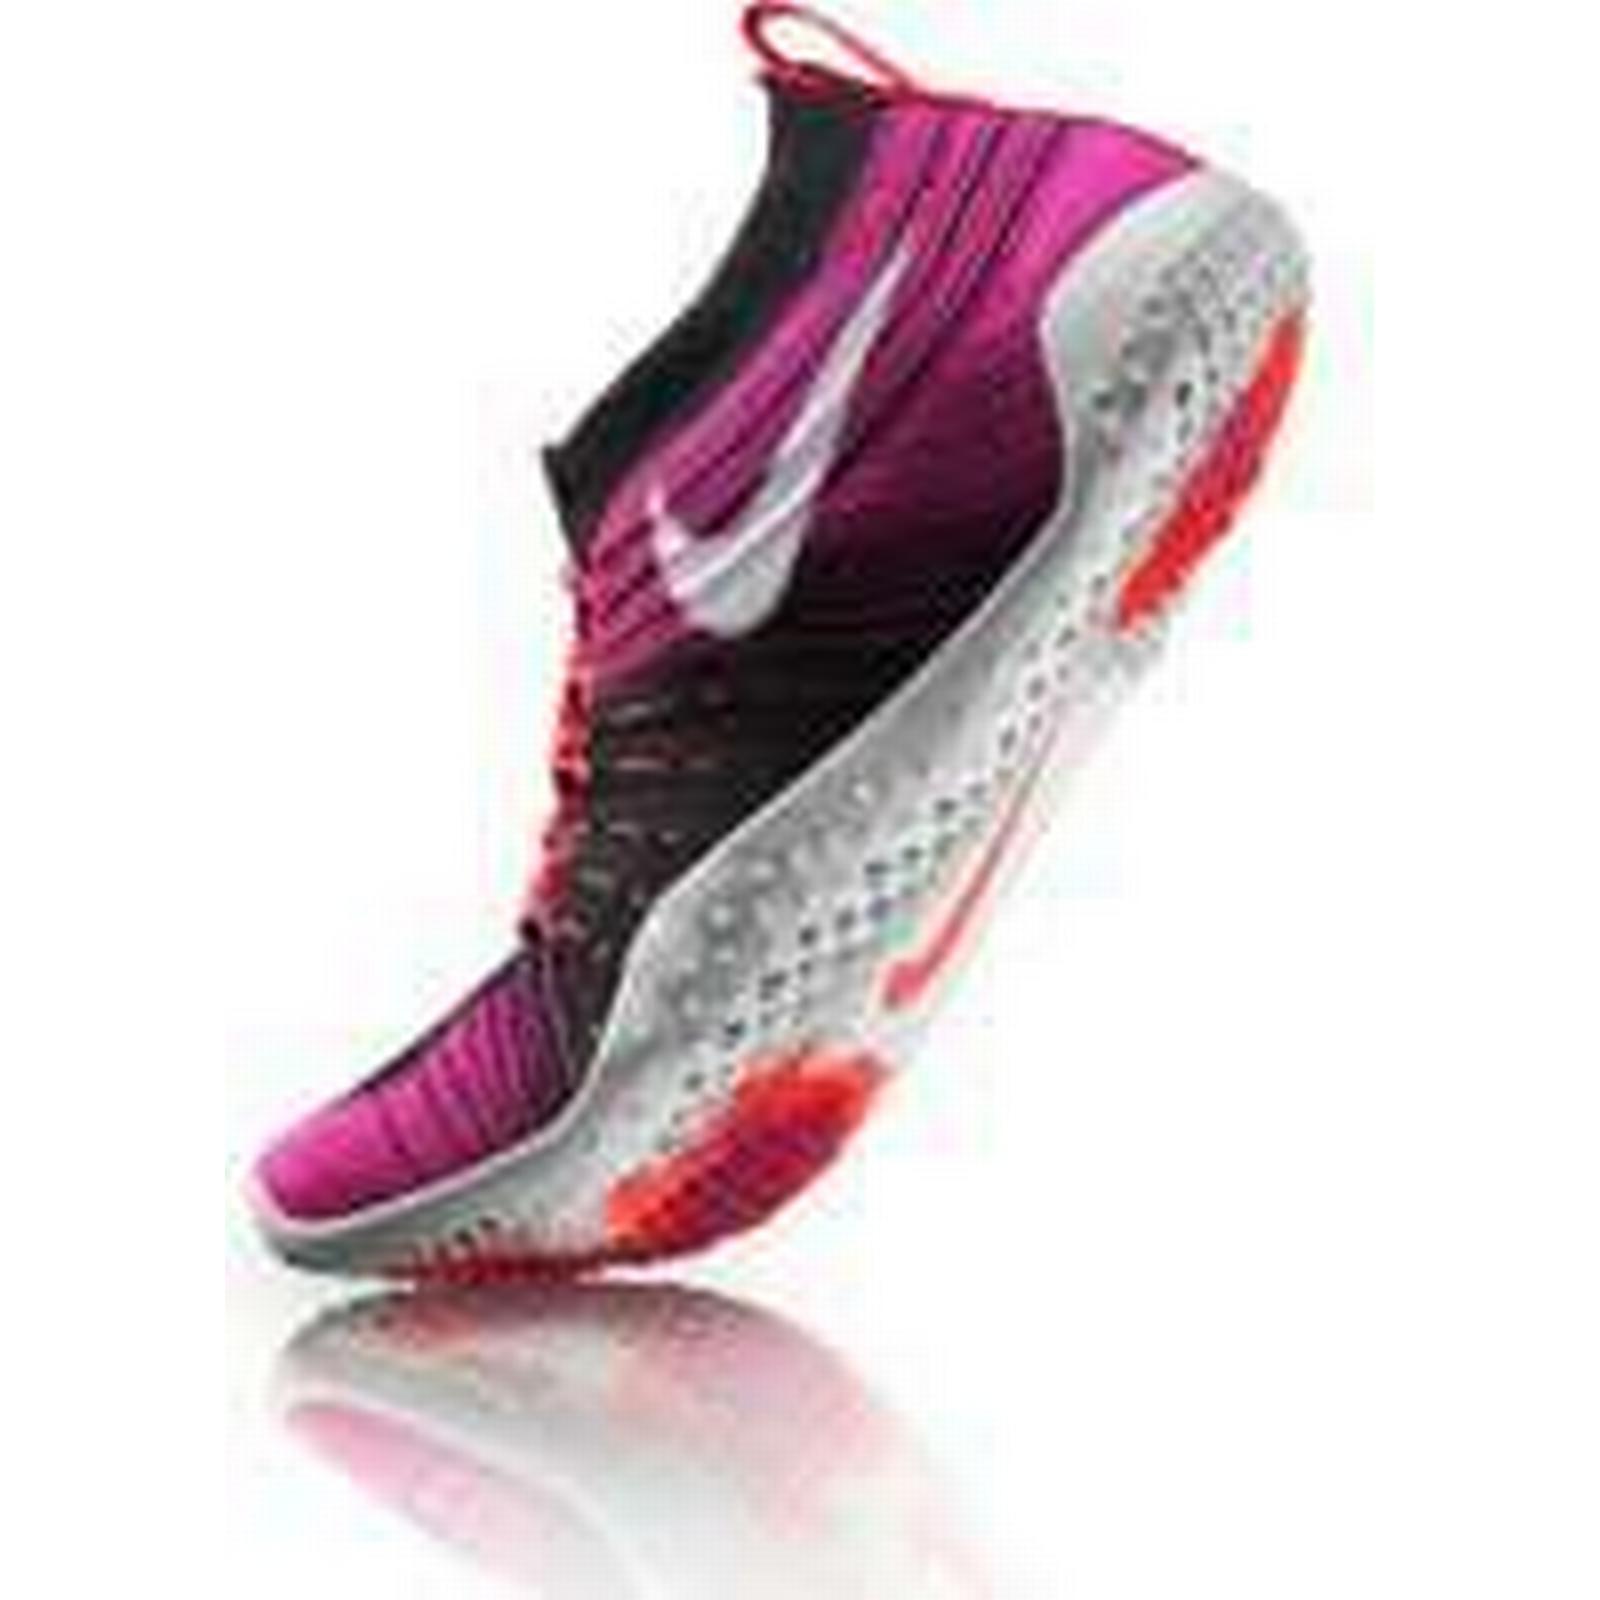 Bonanza (Global) NEW wmn ELITE Nike FREE HYPERFEEL CROSS ELITE wmn USsz: 6.5, 7, 7.5 Retail $175 [638348] 4430a2